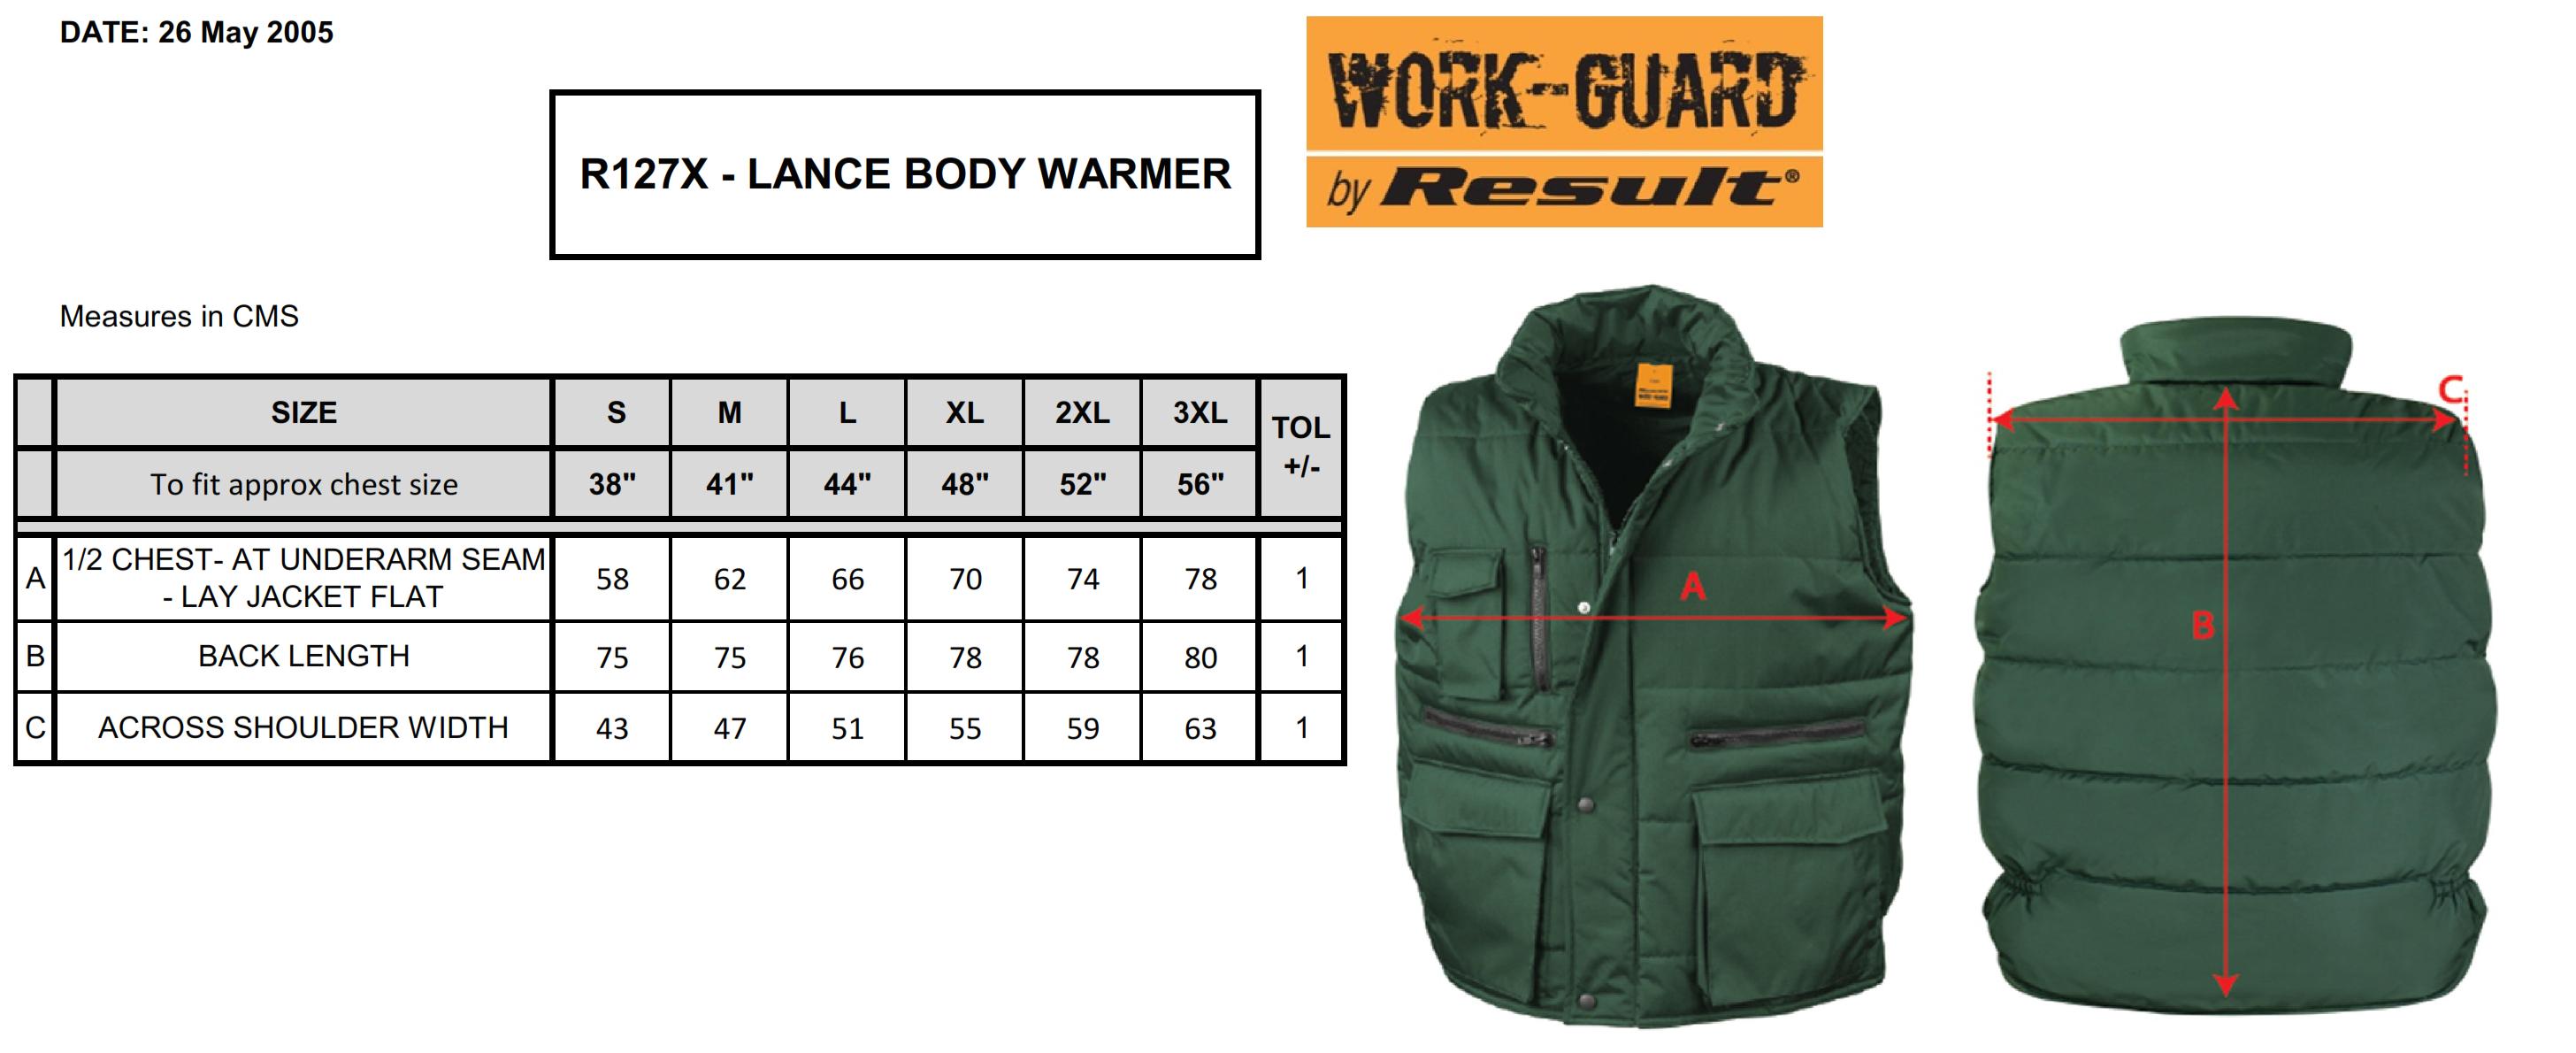 Result: Lance Bodywarmer R127X